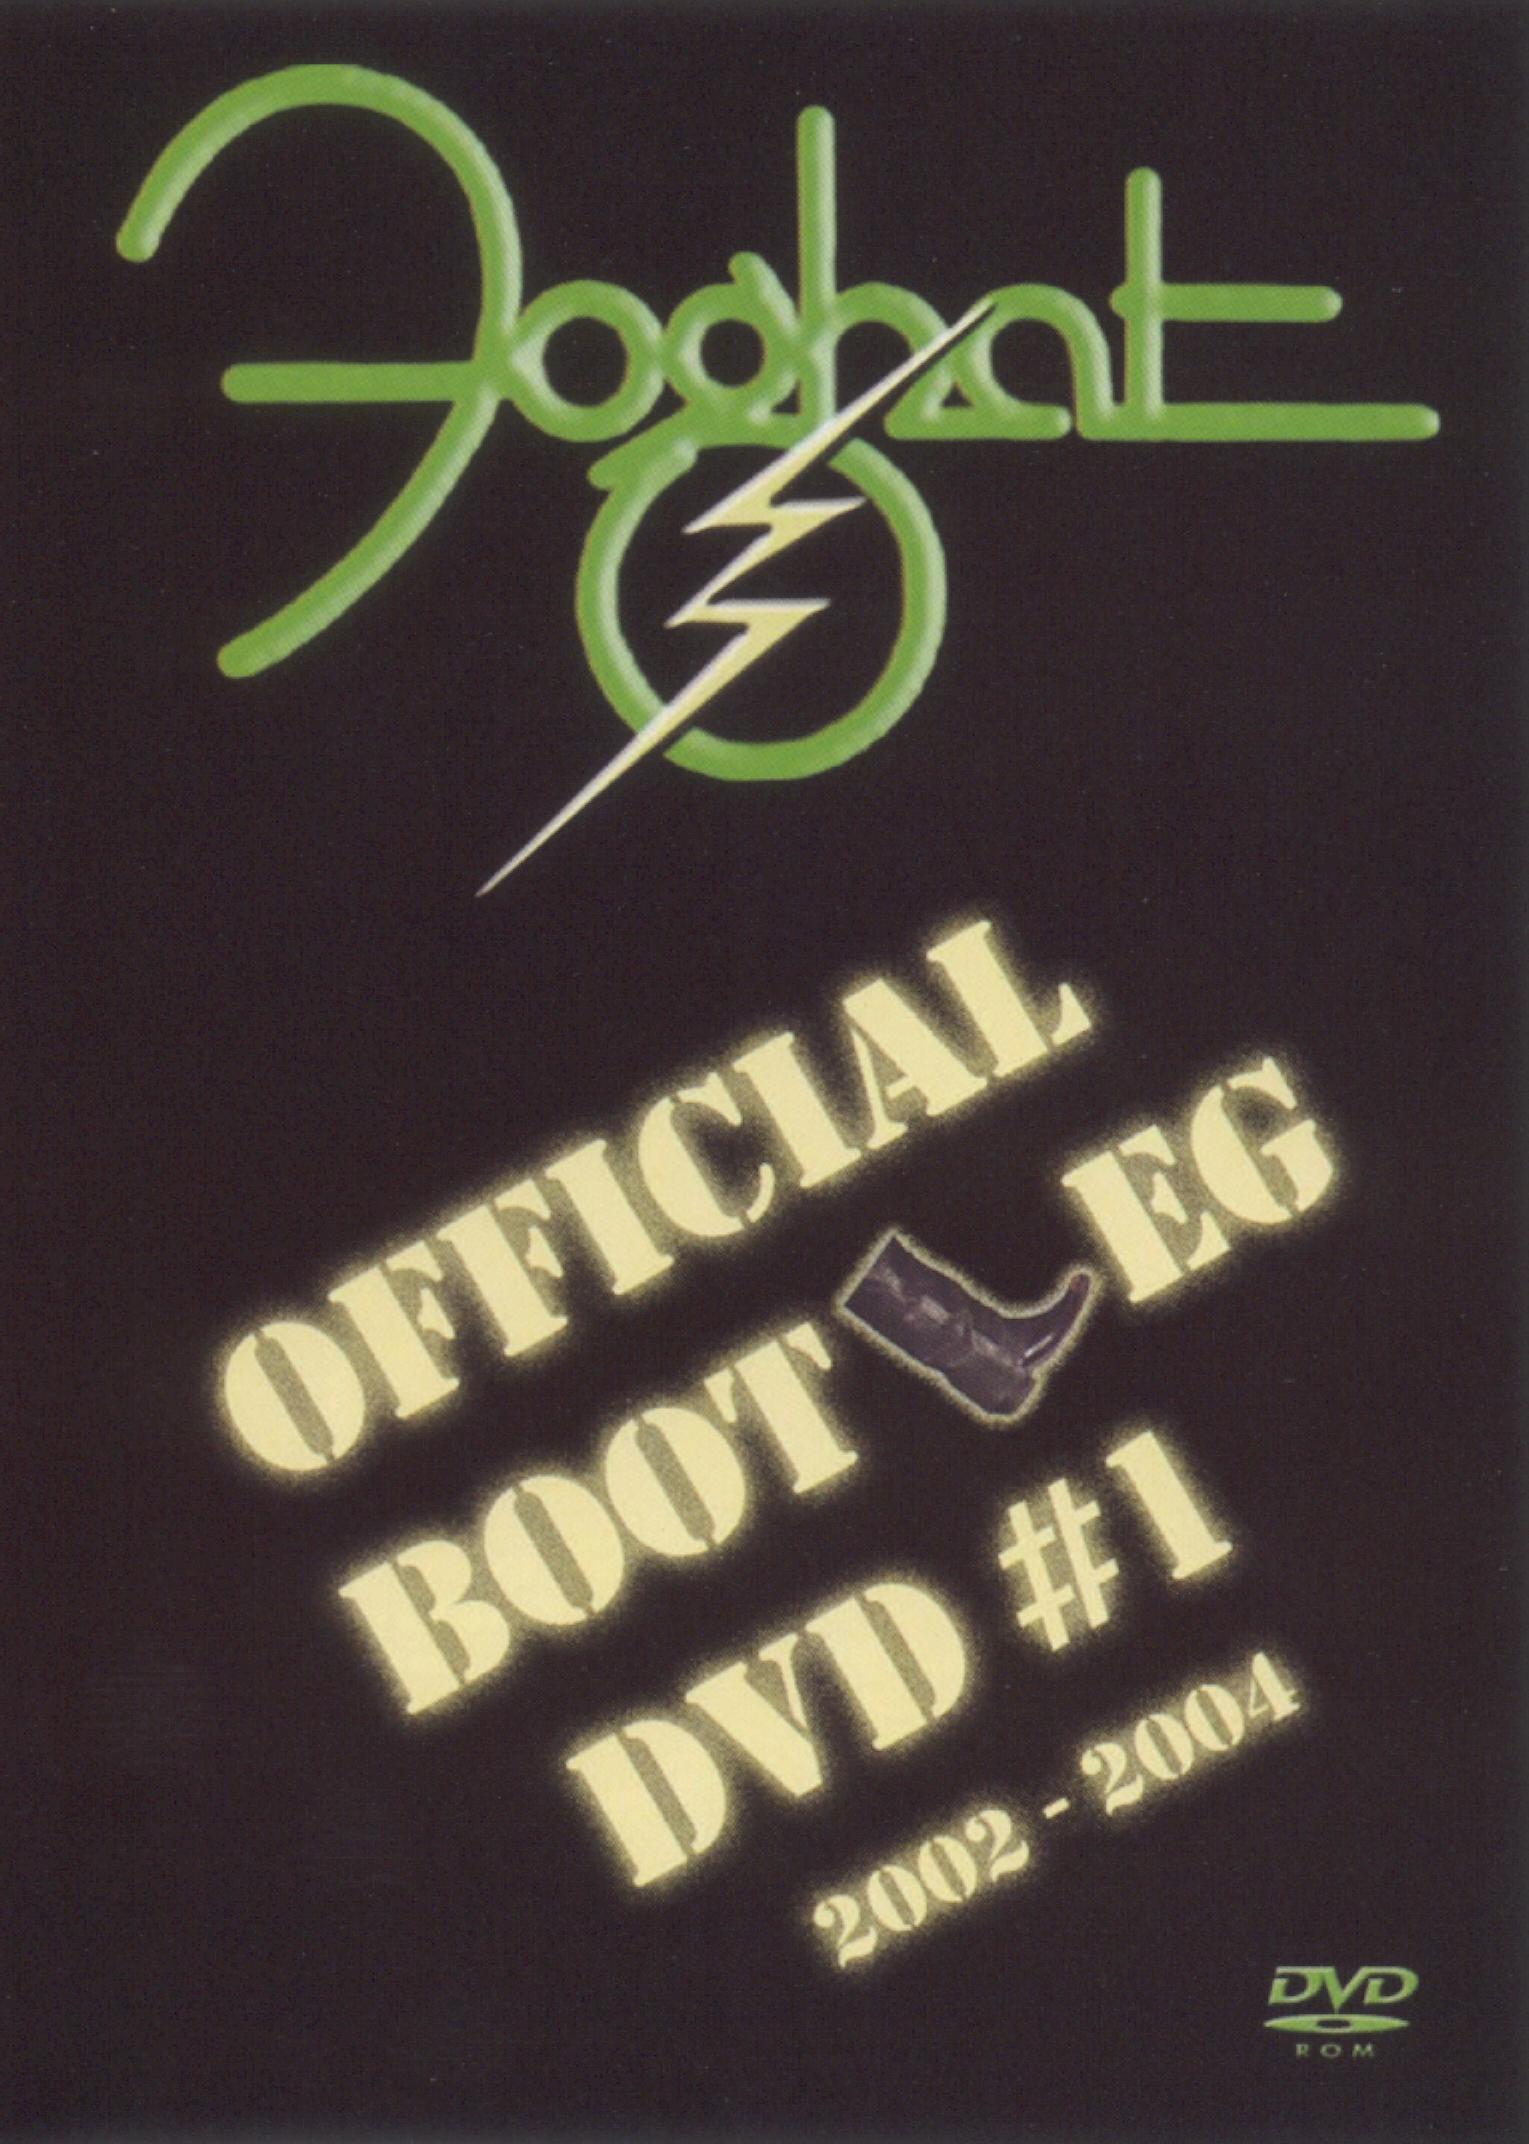 Foghat: The Official Bootleg DVD, Vol. 1 - 2002-2004